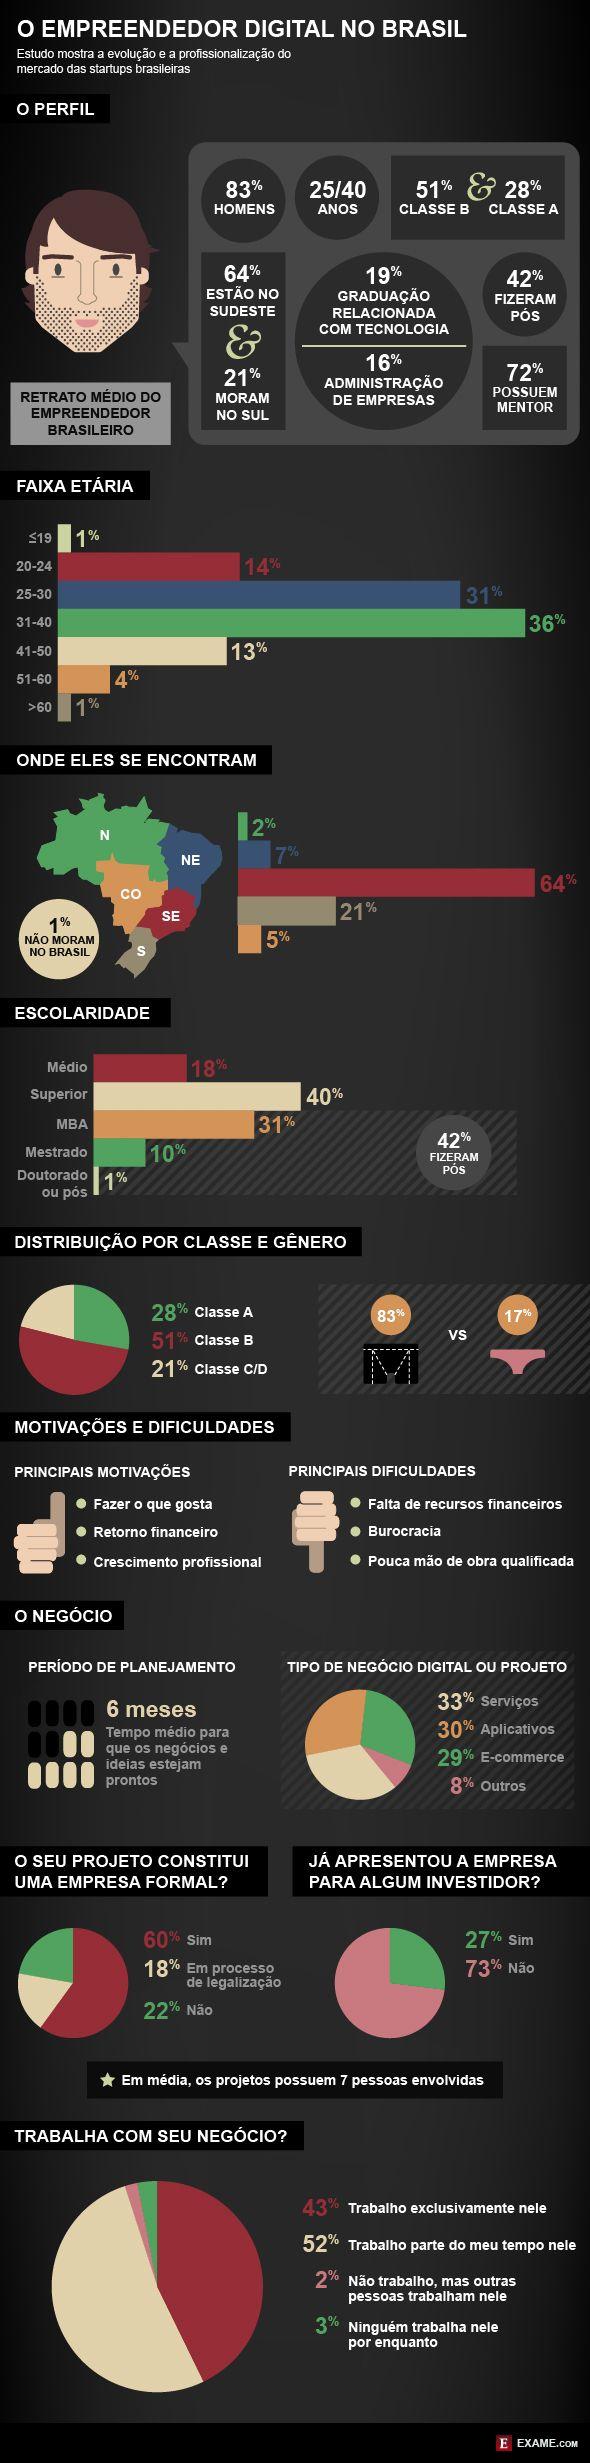 O perfil do empreendedor digital brasileiro.  #empreendedorismo #empresadigital